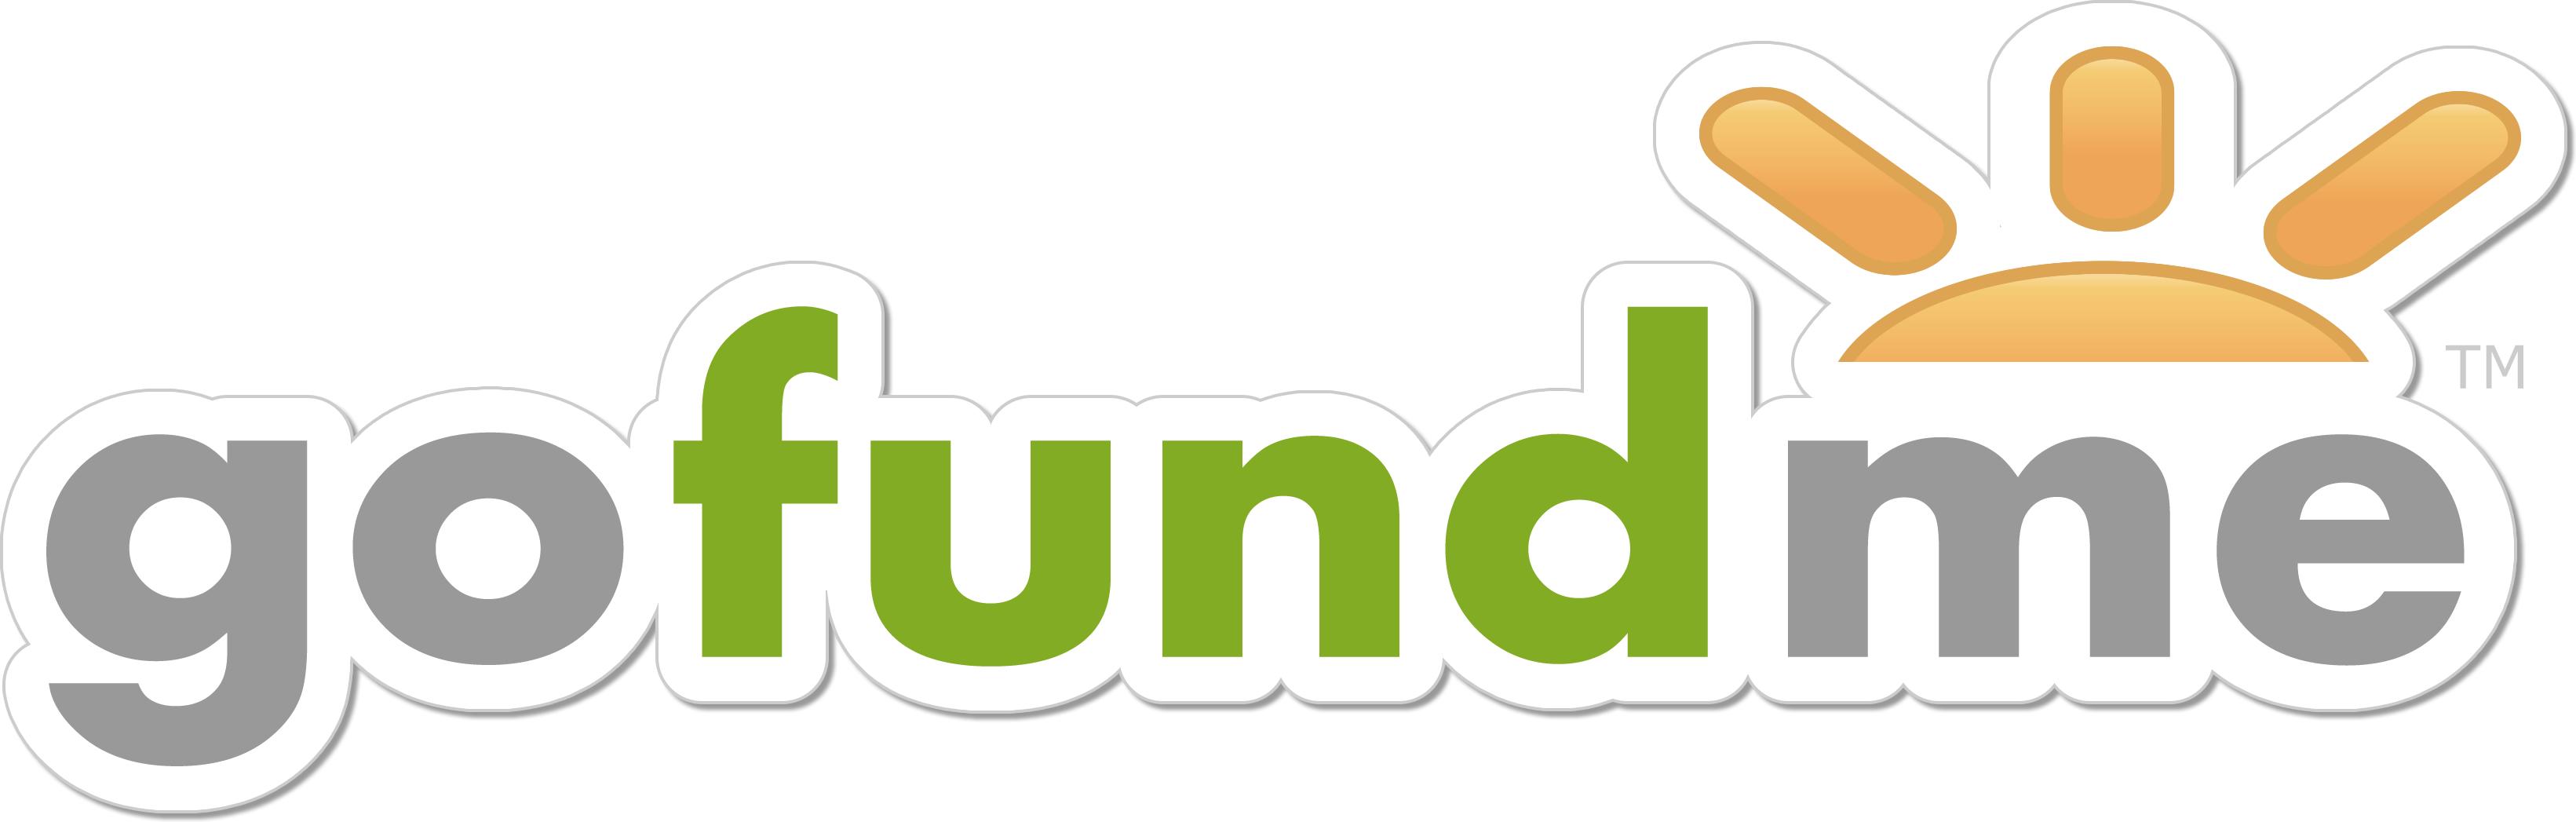 Gofundme - Crowdfunding - Fintechnews